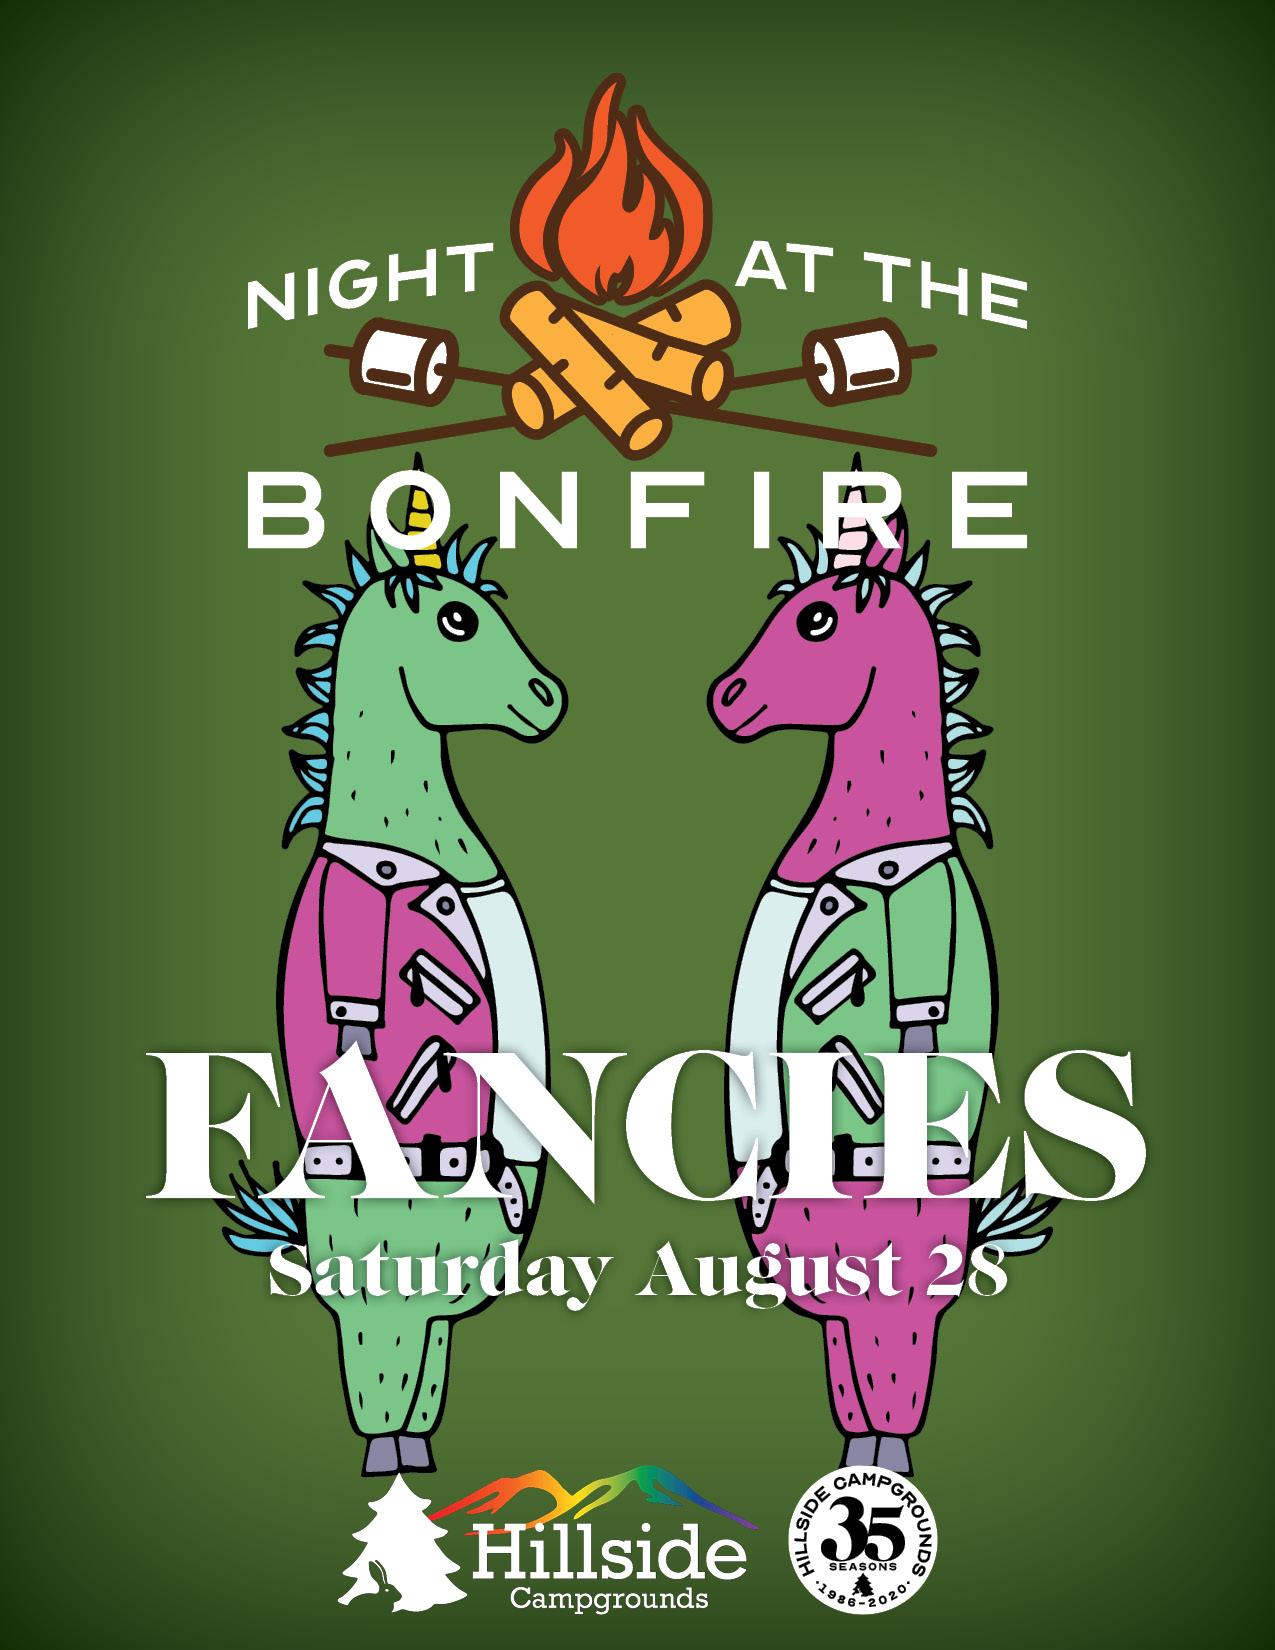 night at bonfire leather3 fancies